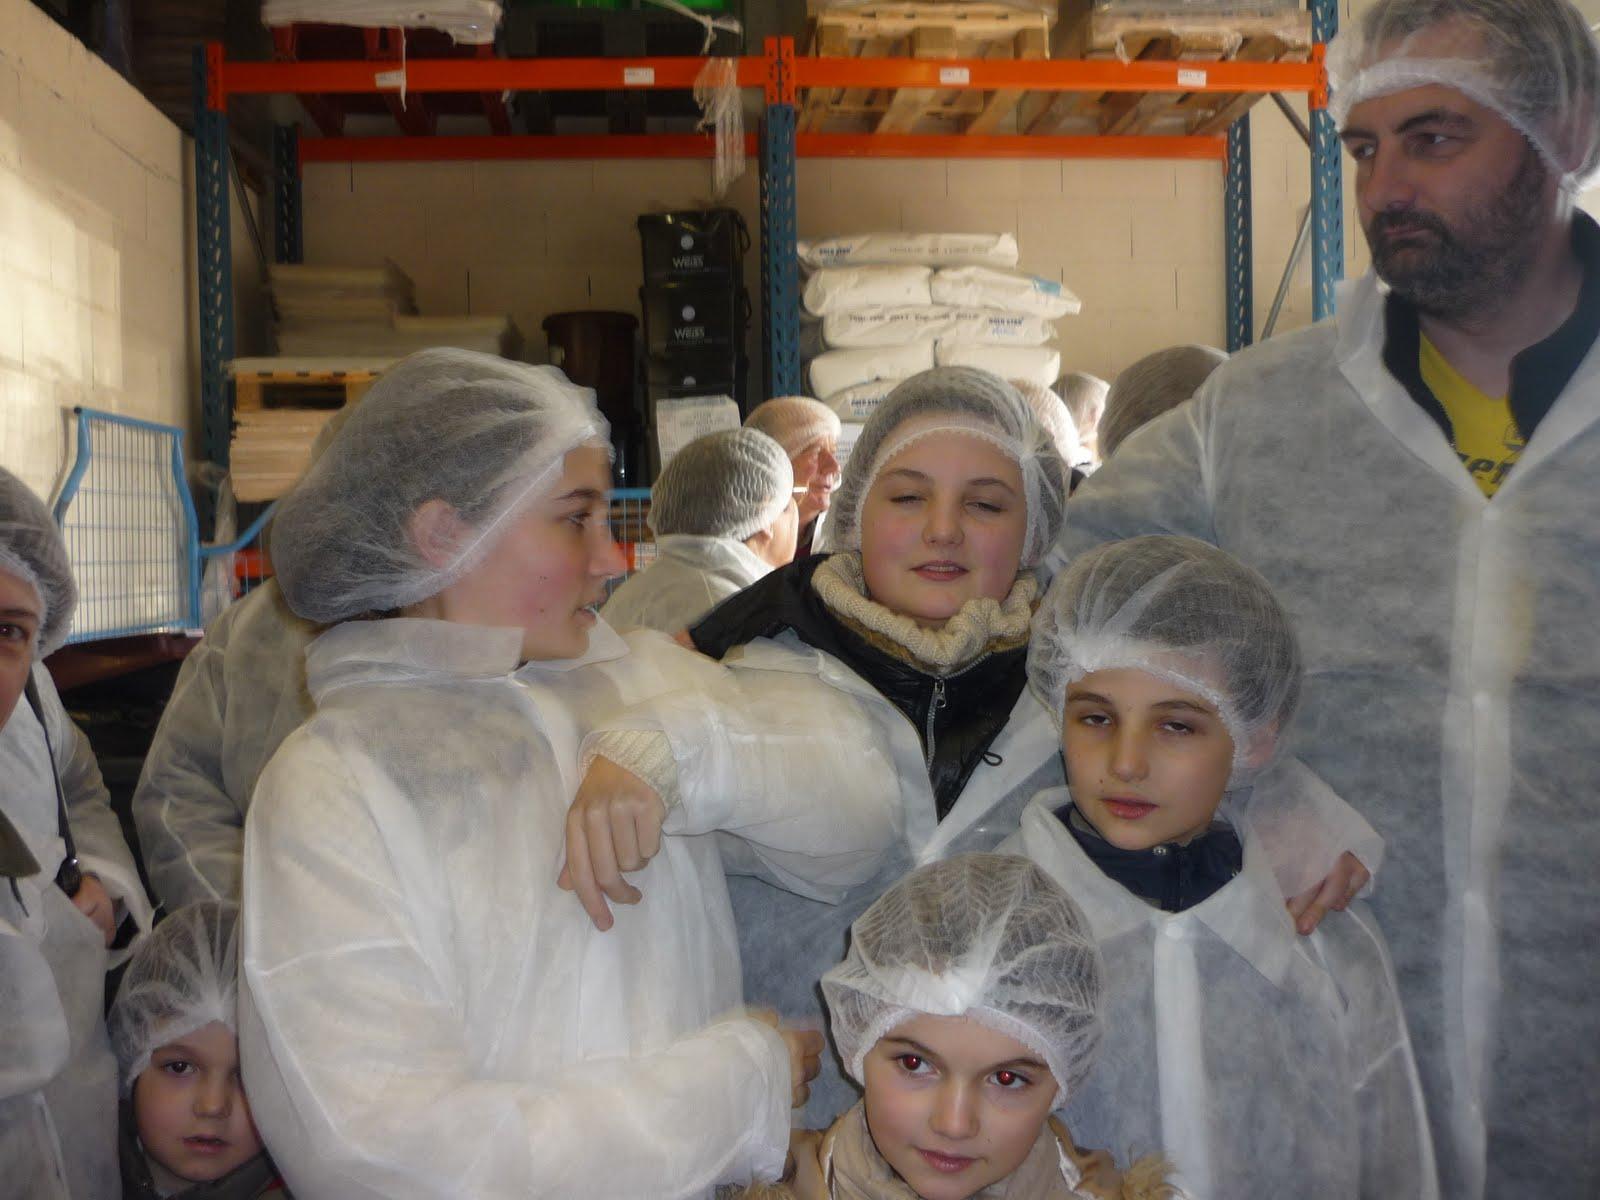 O'zon Vivre VISITE DE LA CHOCOLATERIE DE NEUVILLE AUX BOIS # Chocolaterie De Neuville Aux Bois